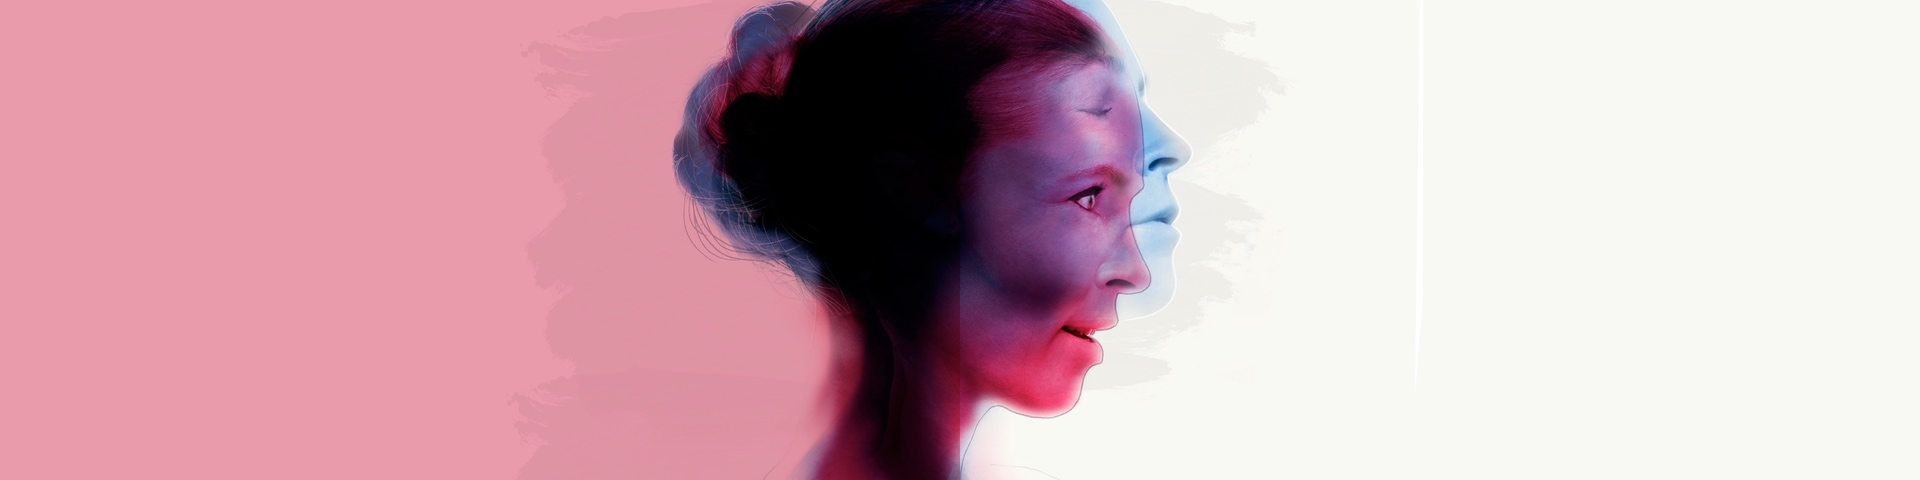 Vi står sammen med  Crystal Water  og  Neurowave !  Les mer om messen på  www.bodymindspirit.no .